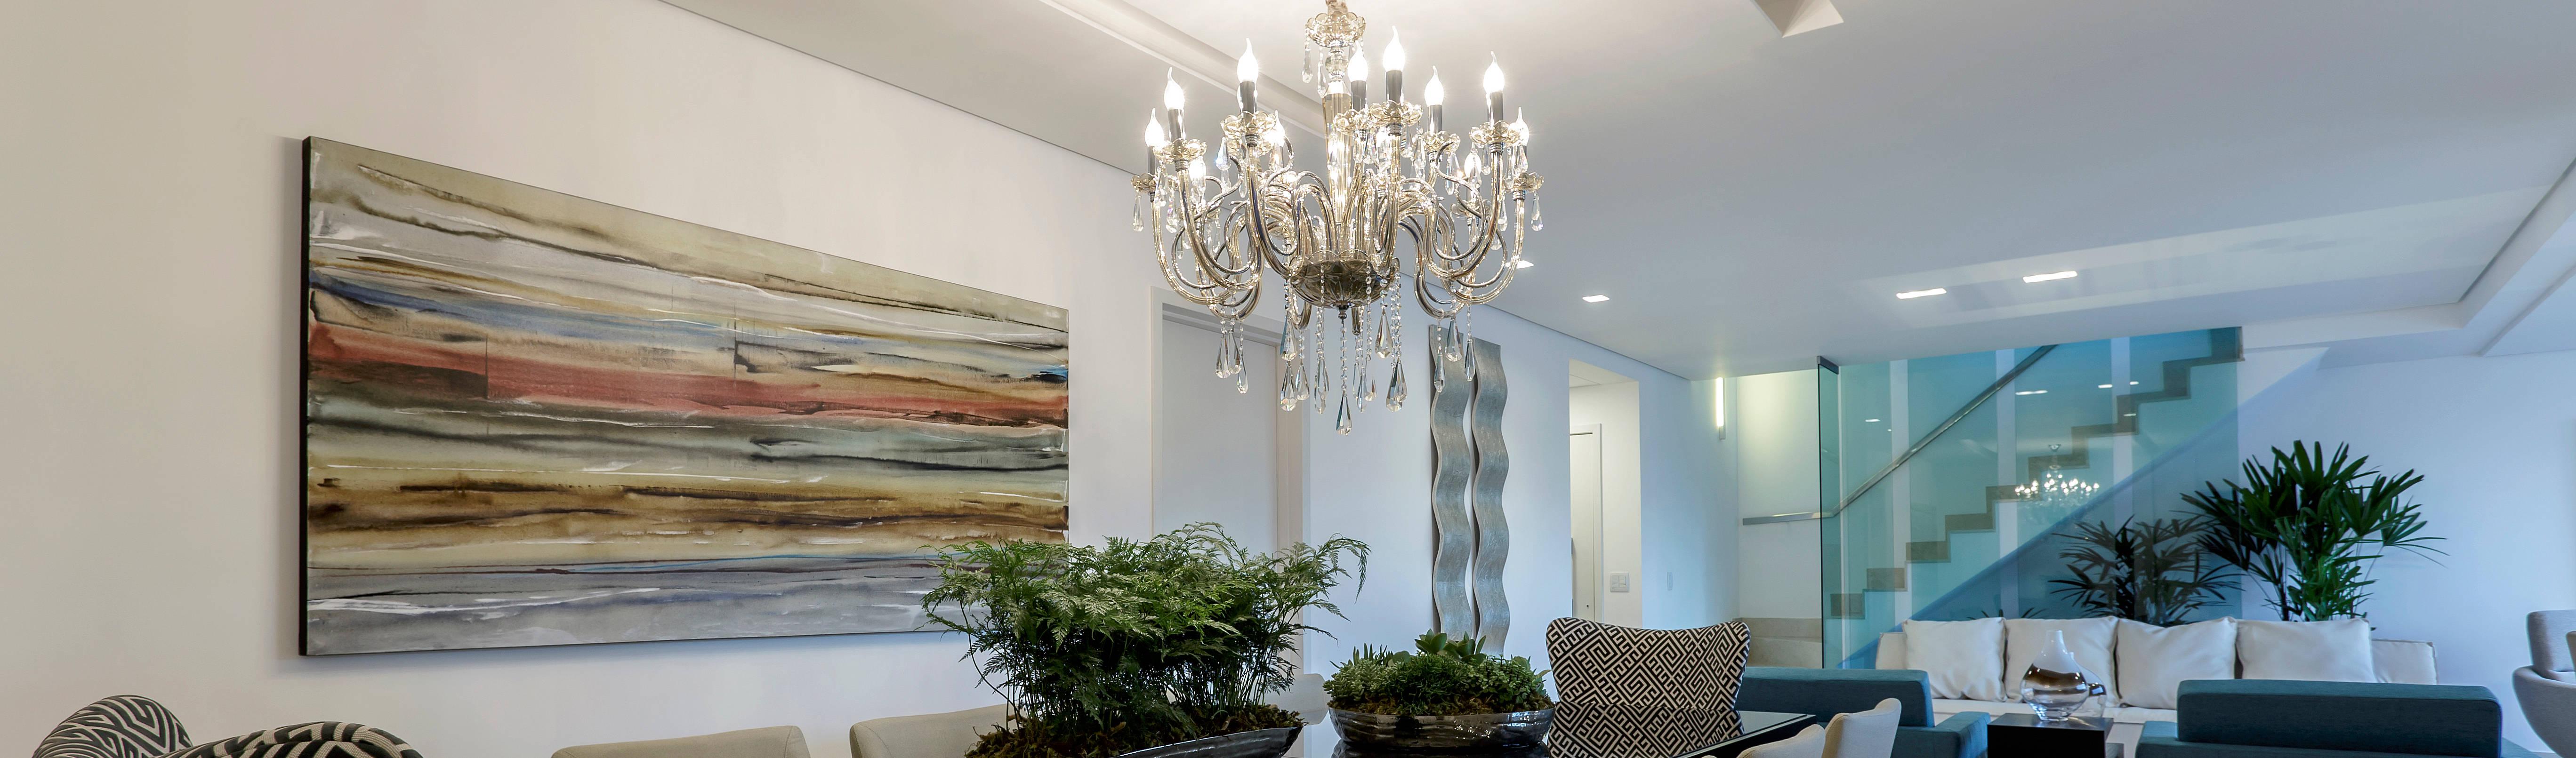 JANAINA NAVES – Design & Arquitetura